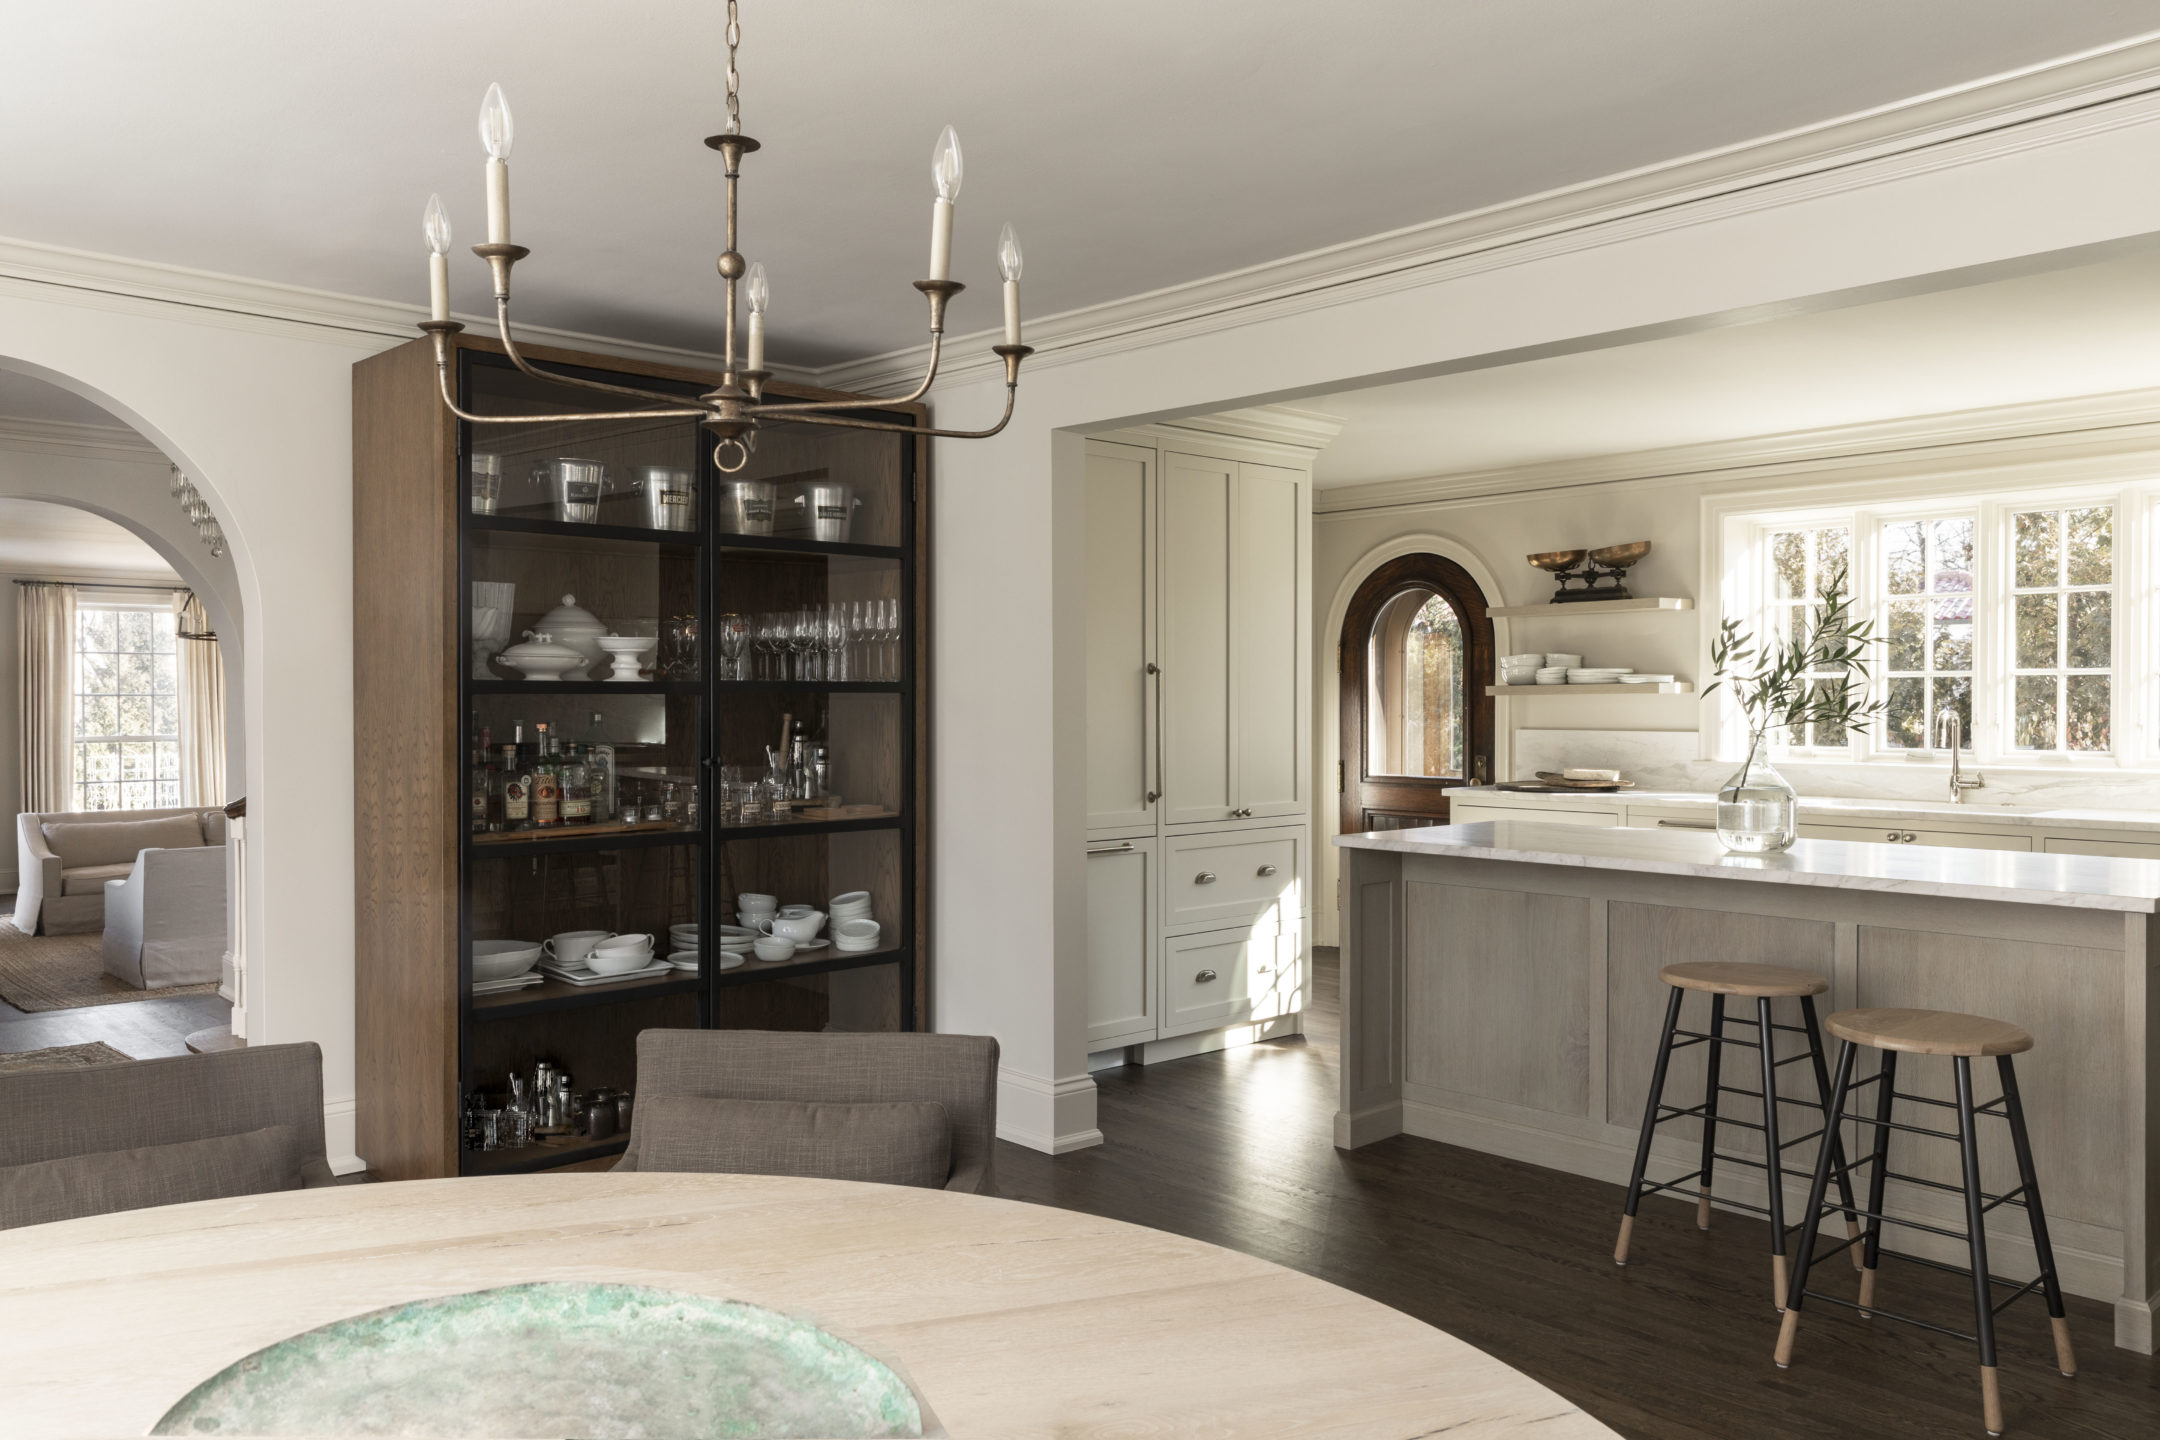 05 - Kitchen & Dining Room